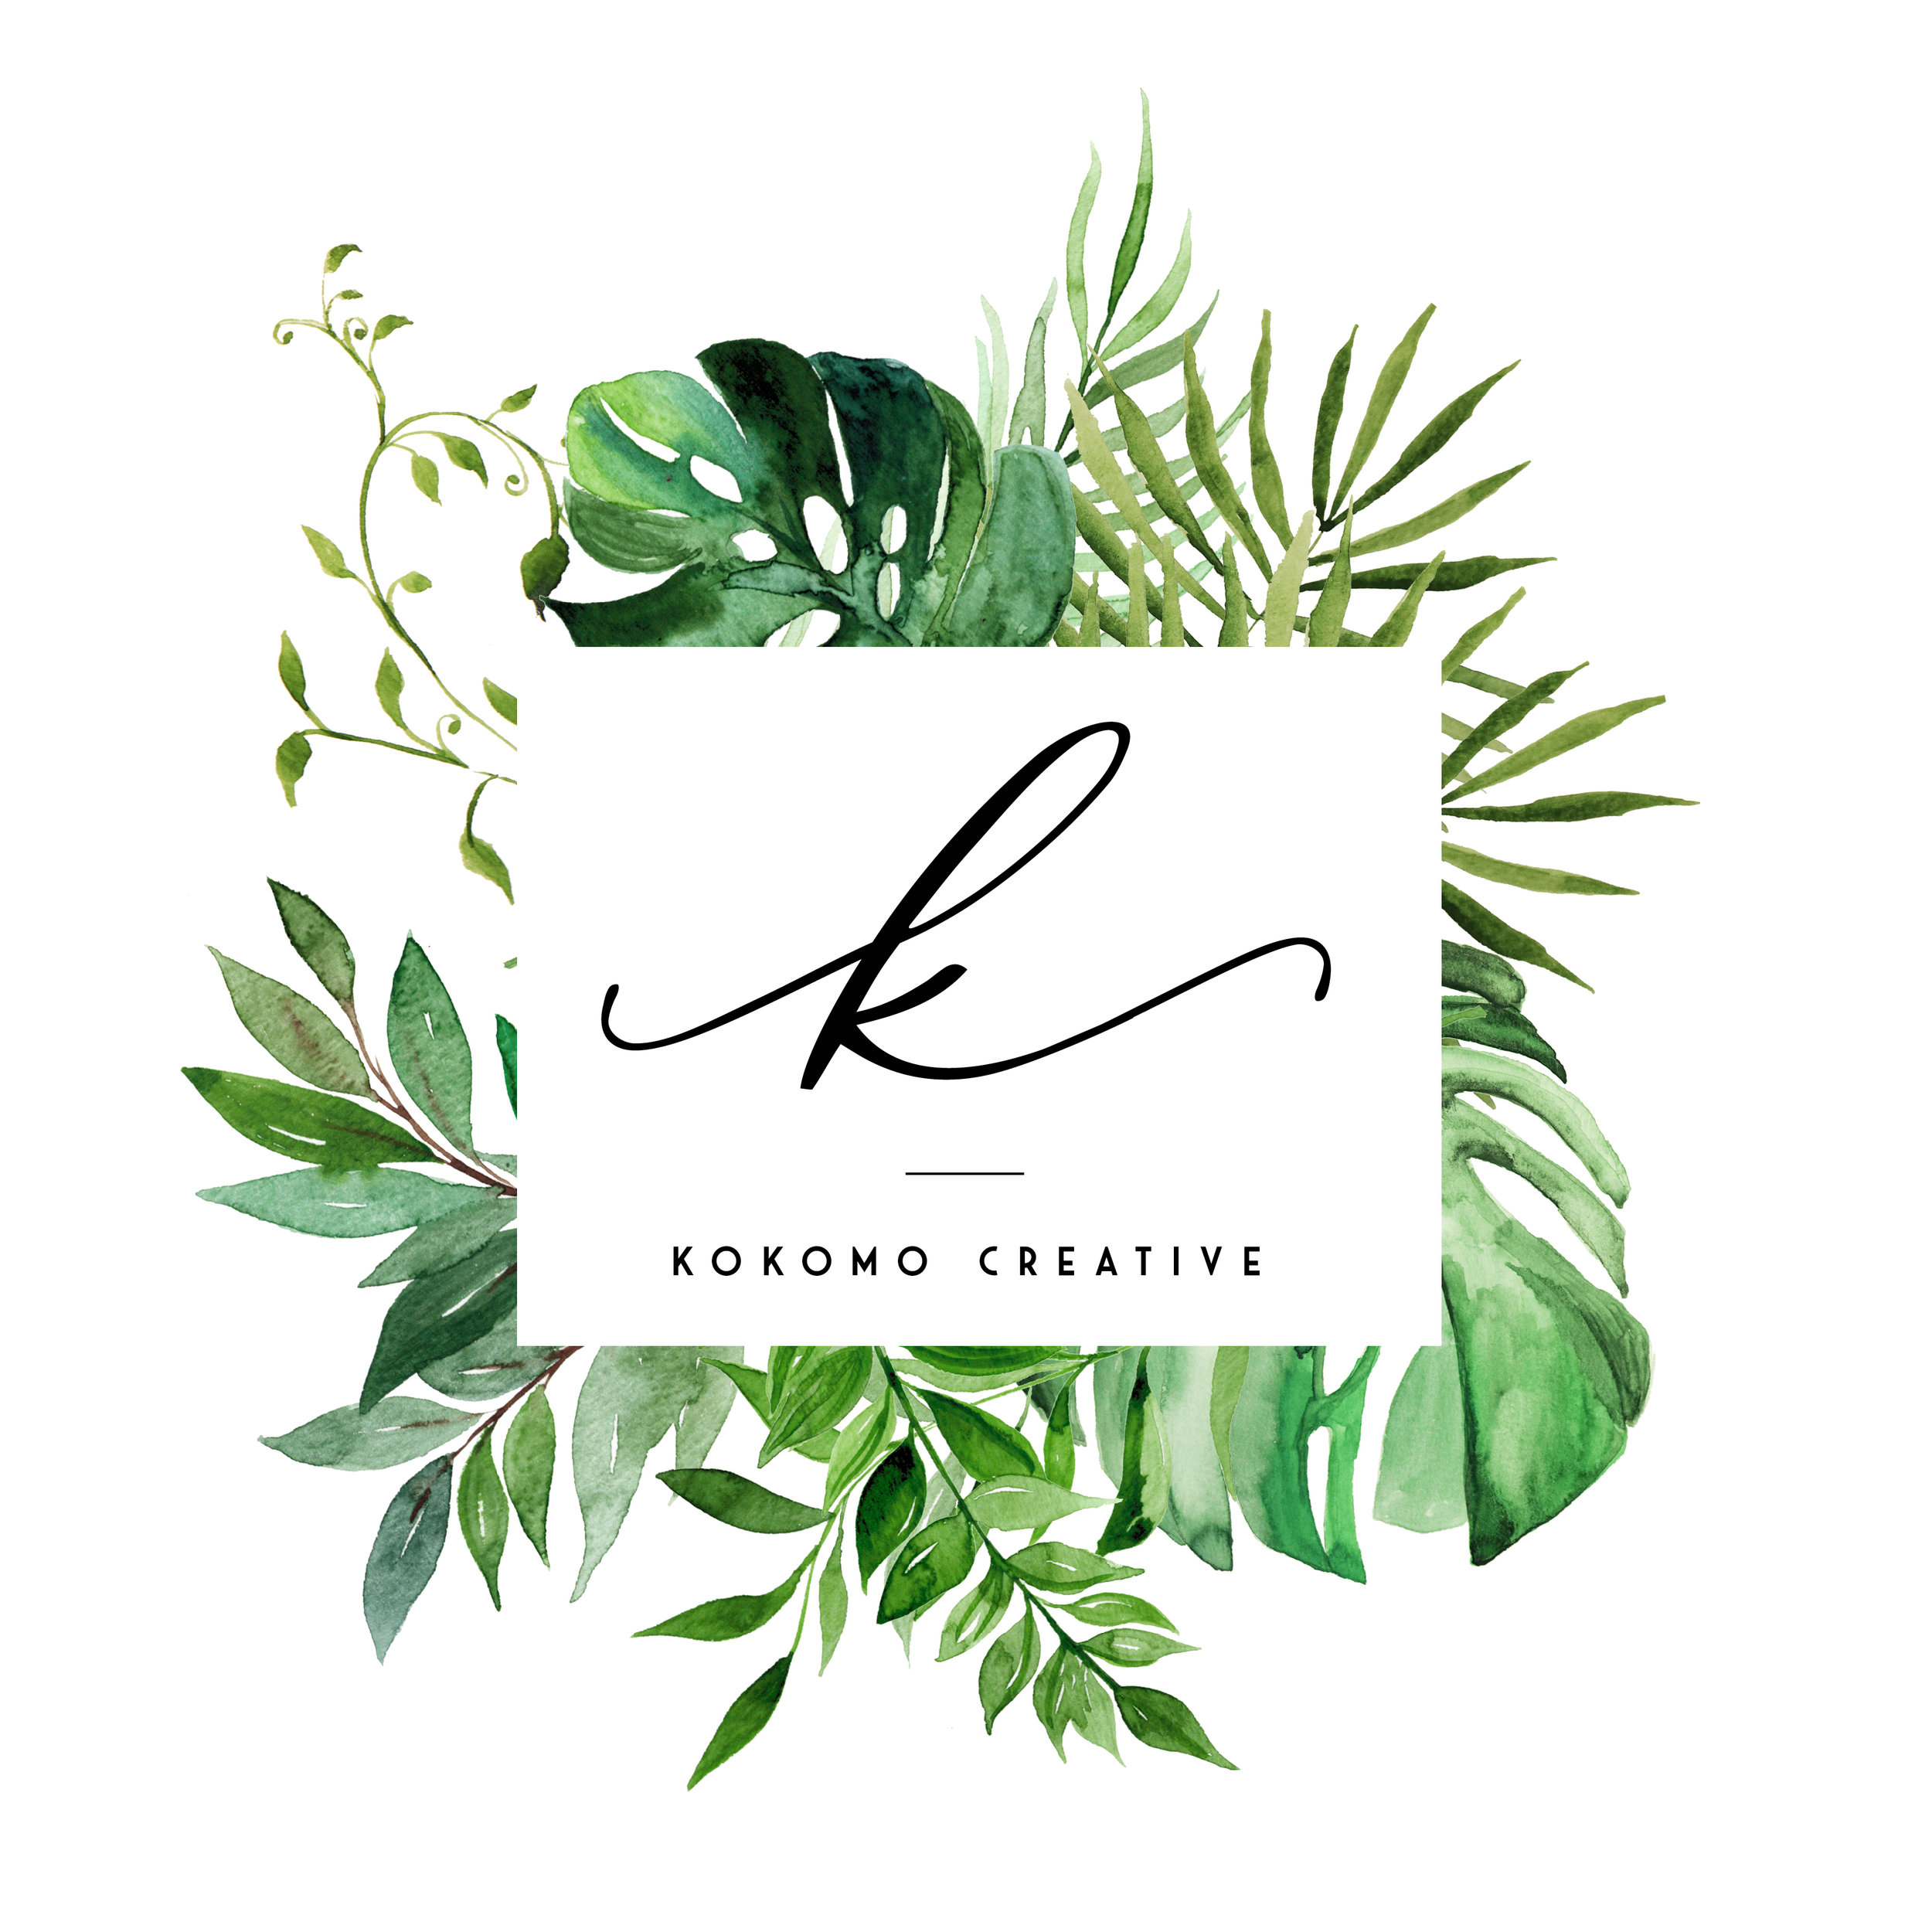 Kokomo_Branding12.jpg